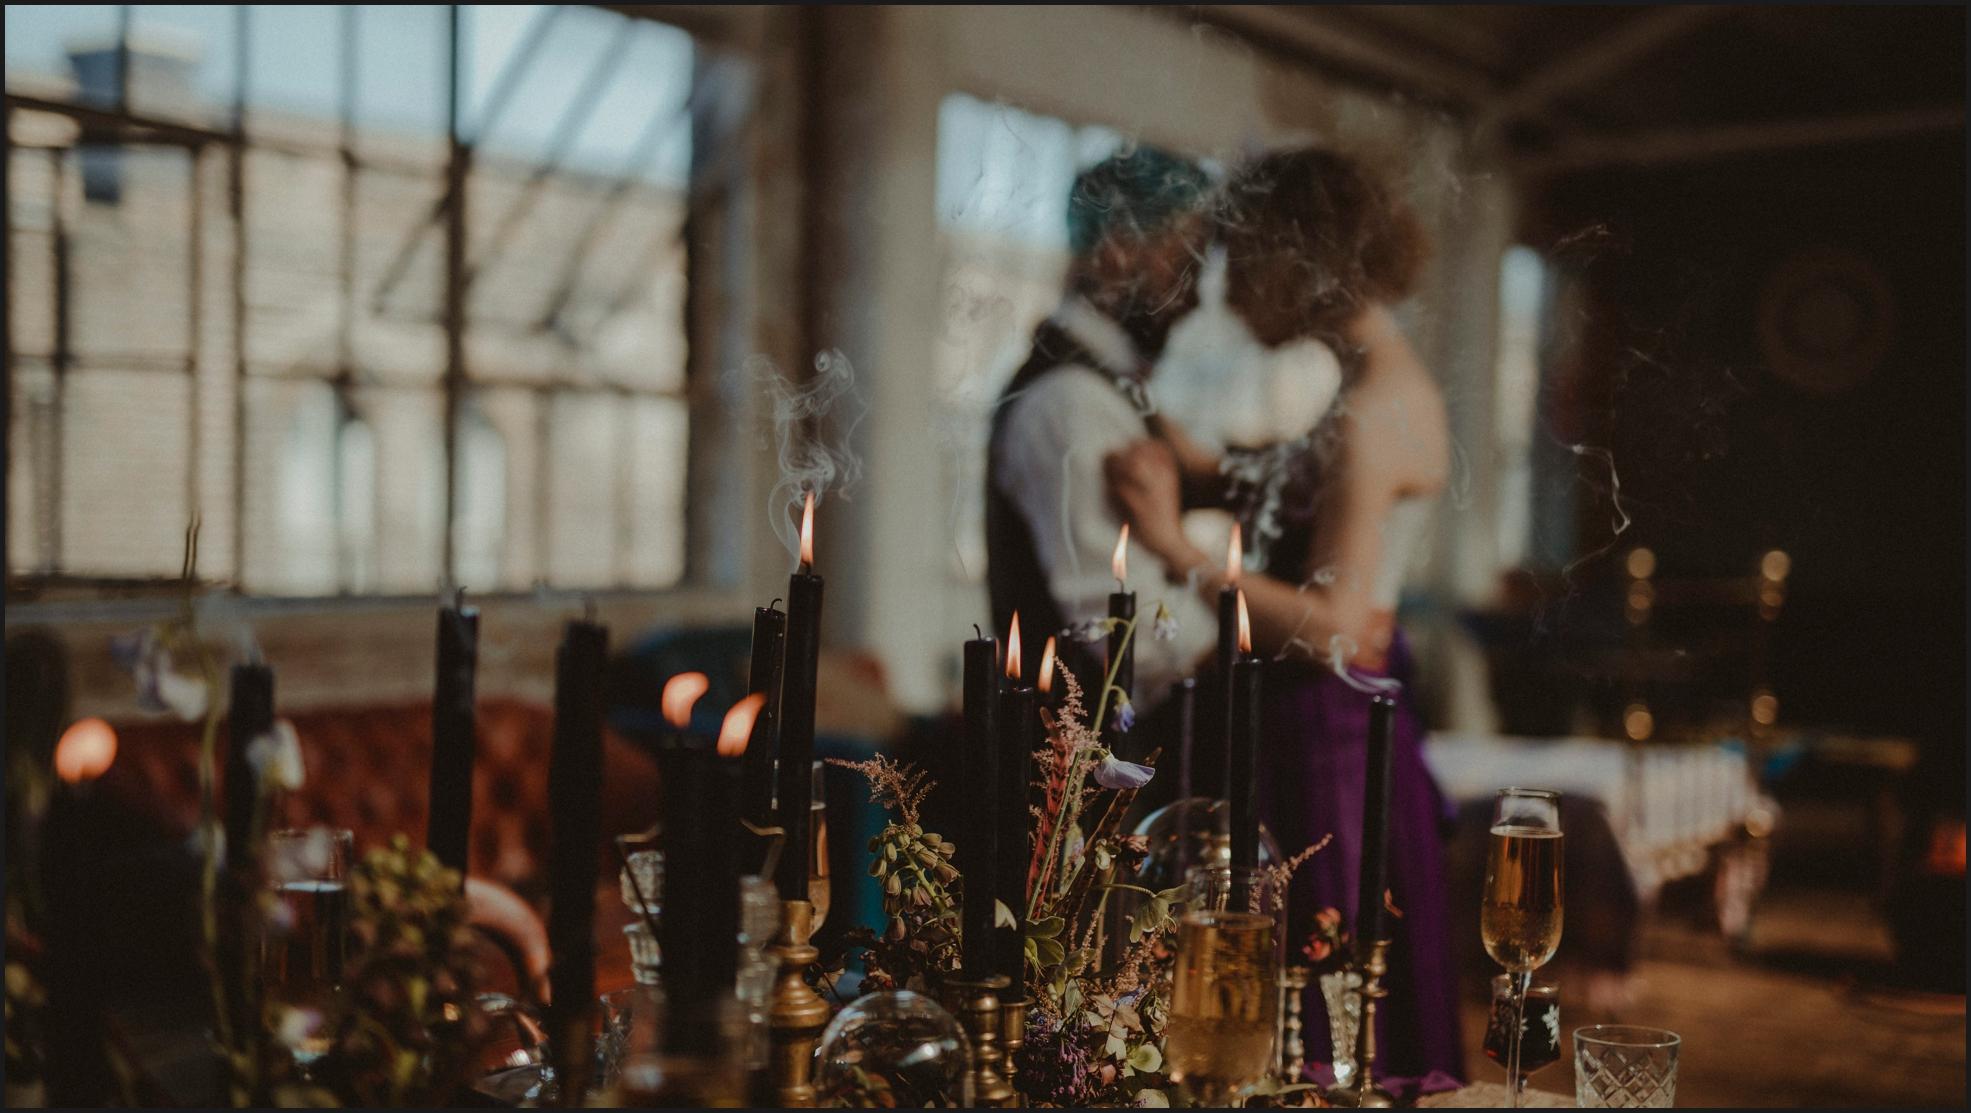 alternative wedding photographer, blurry image, steampunk